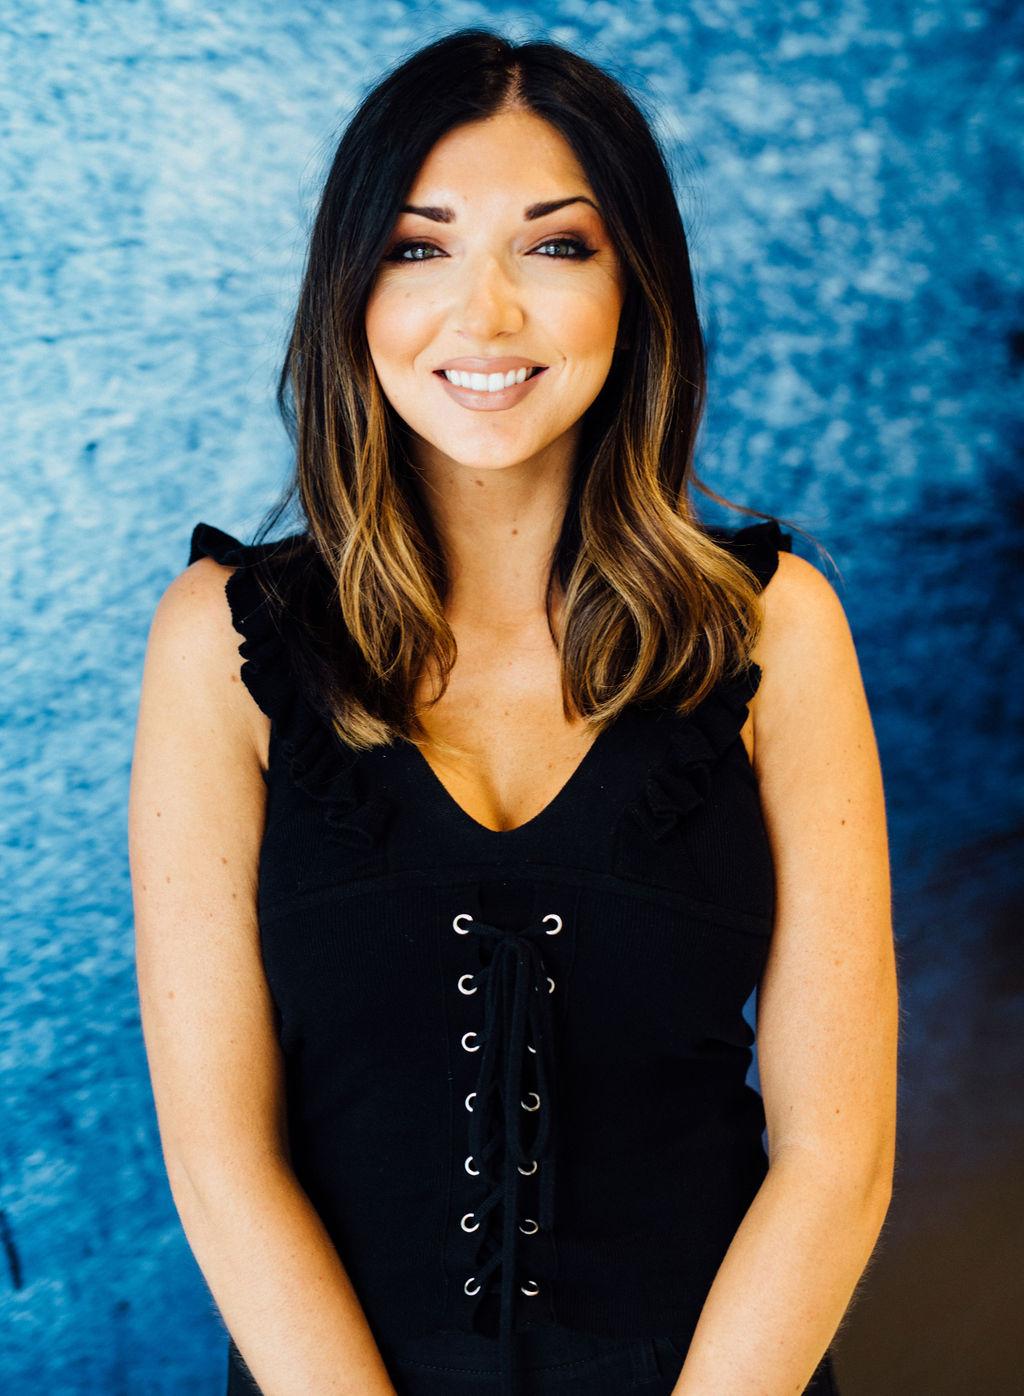 Deanna Falconetti